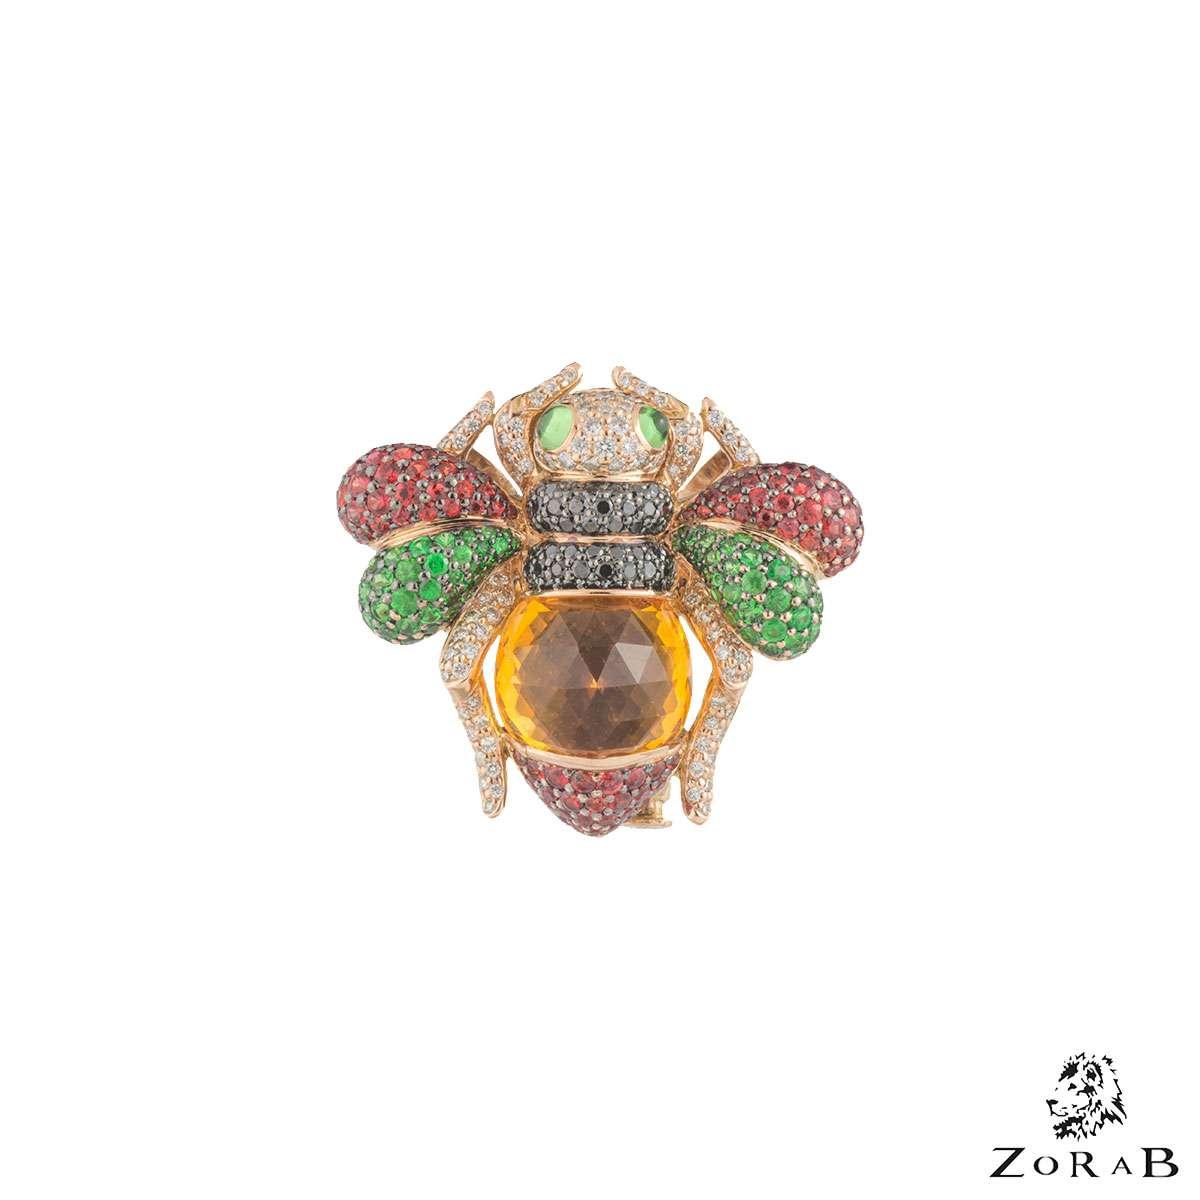 Zorab Multi-Gemstone 3 in 1 Jewellery Piece